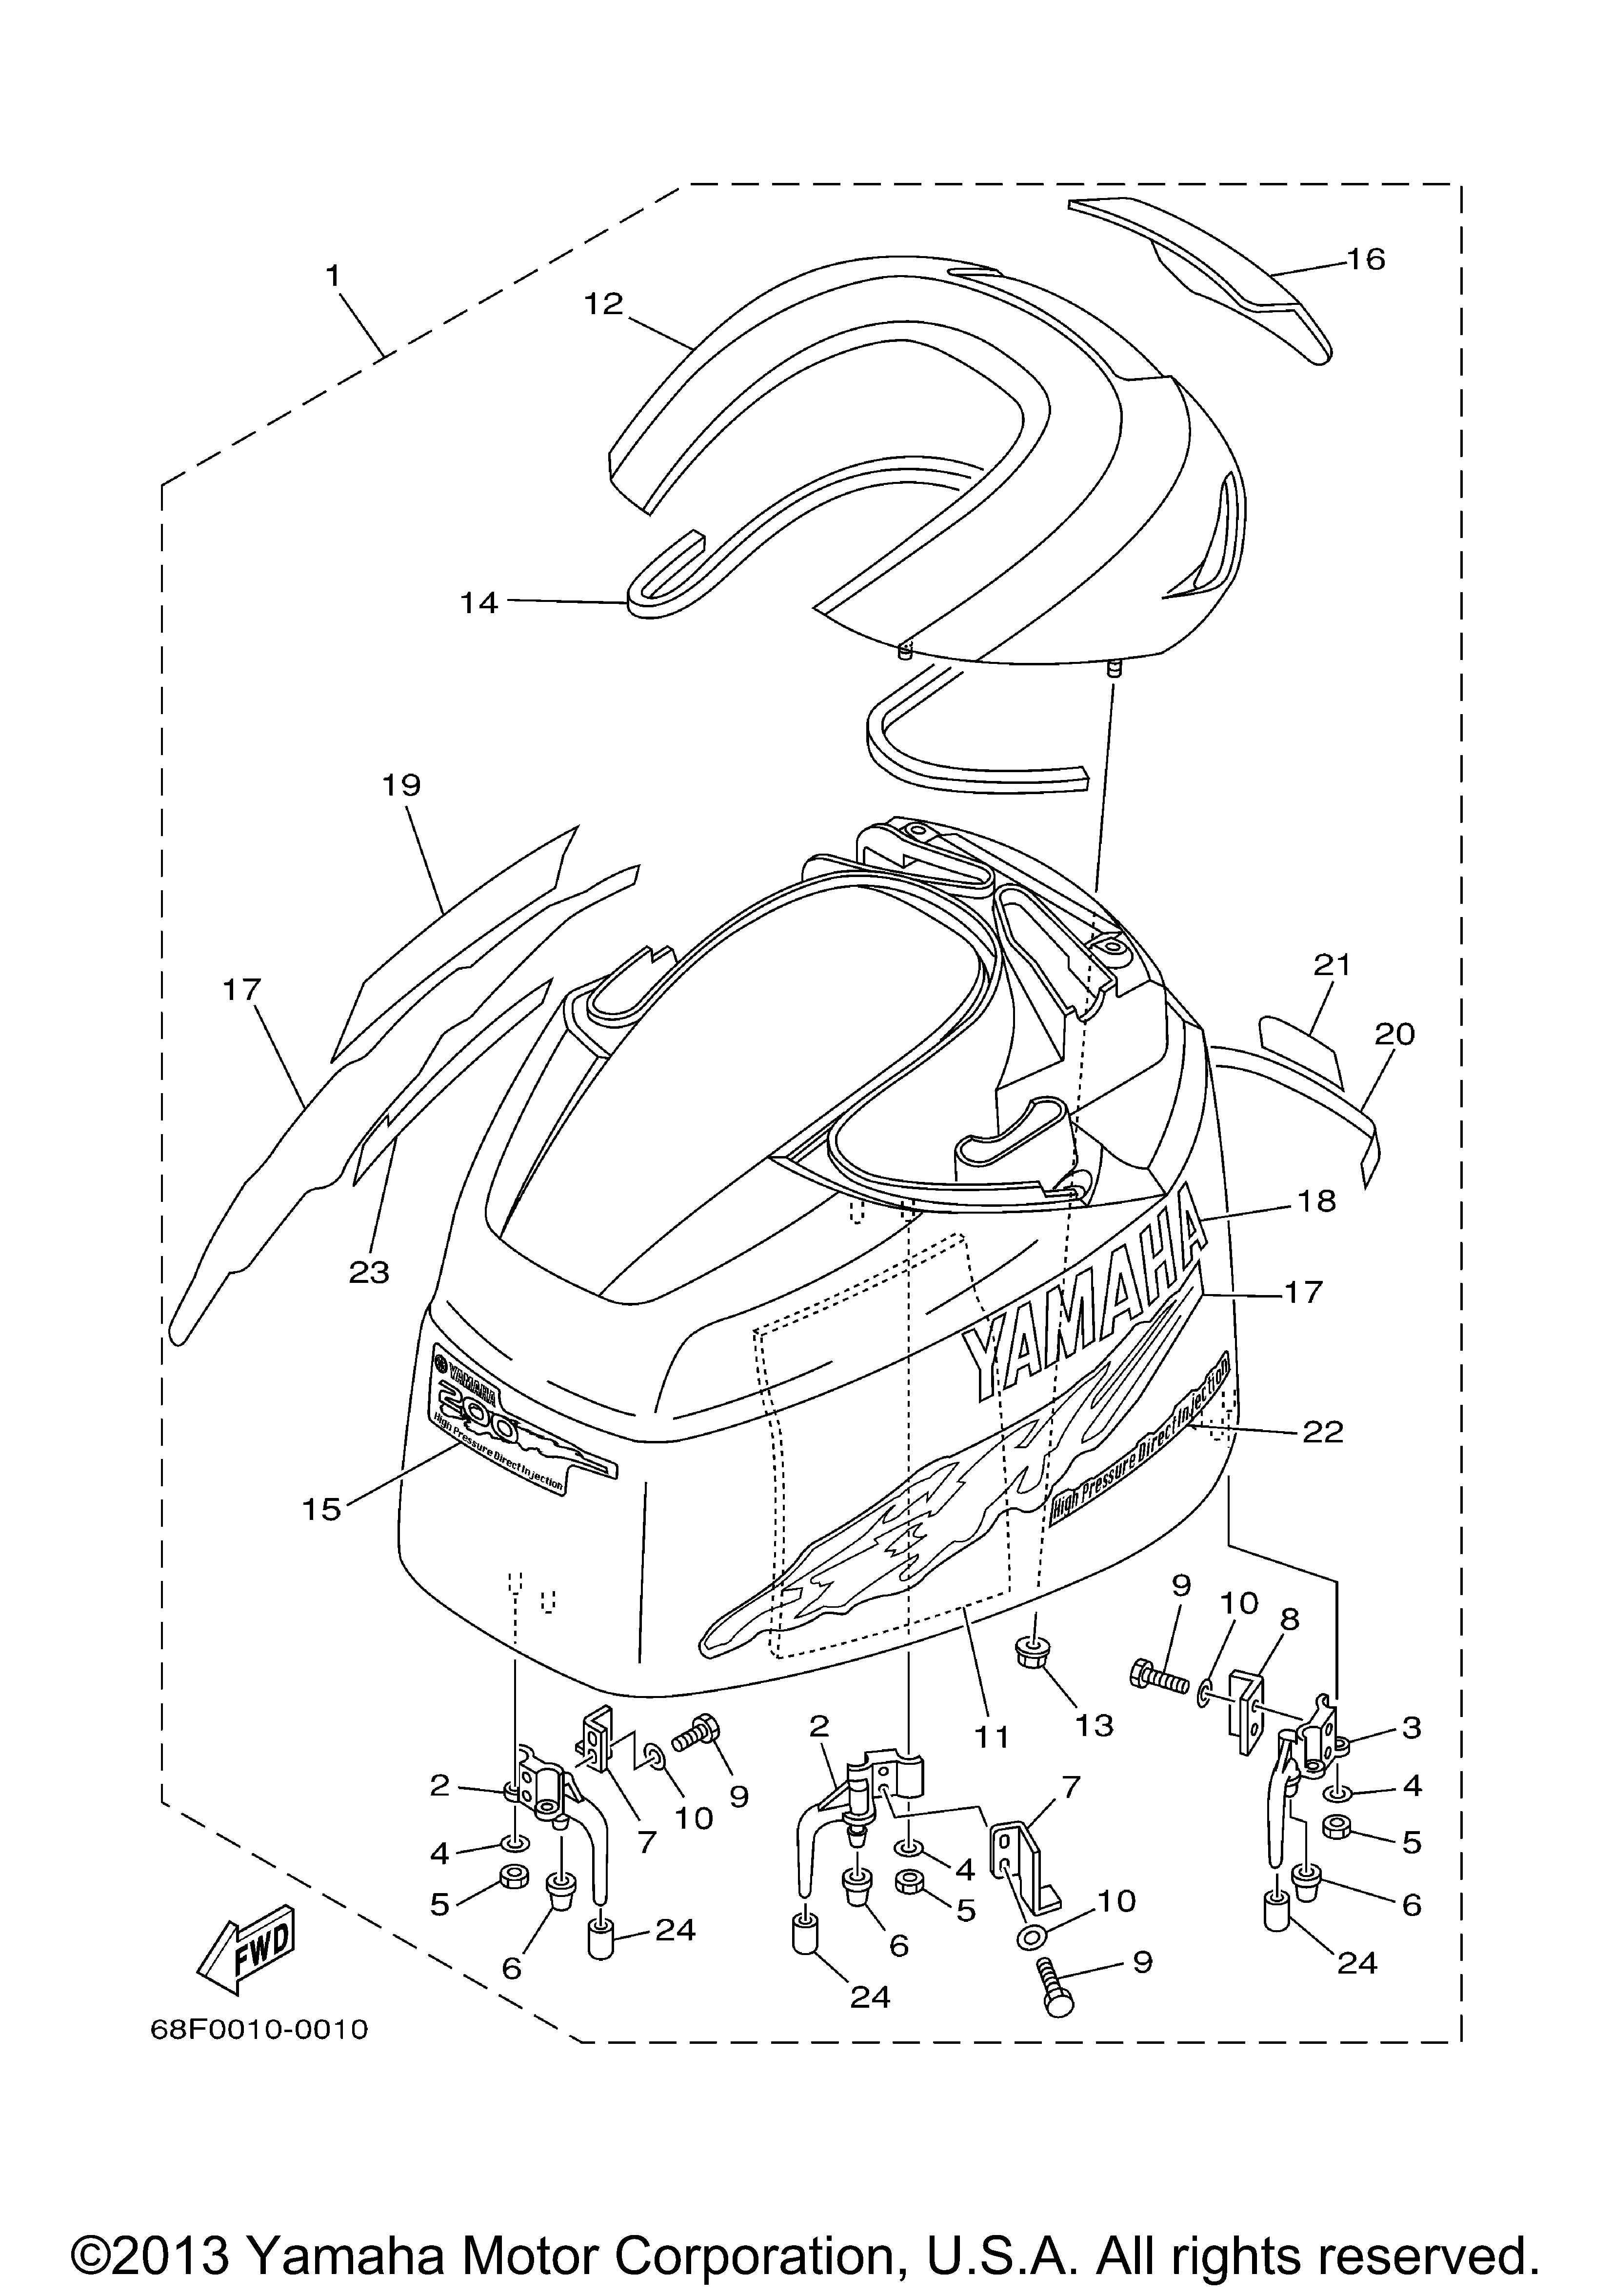 yamaha outboard motor parts usa